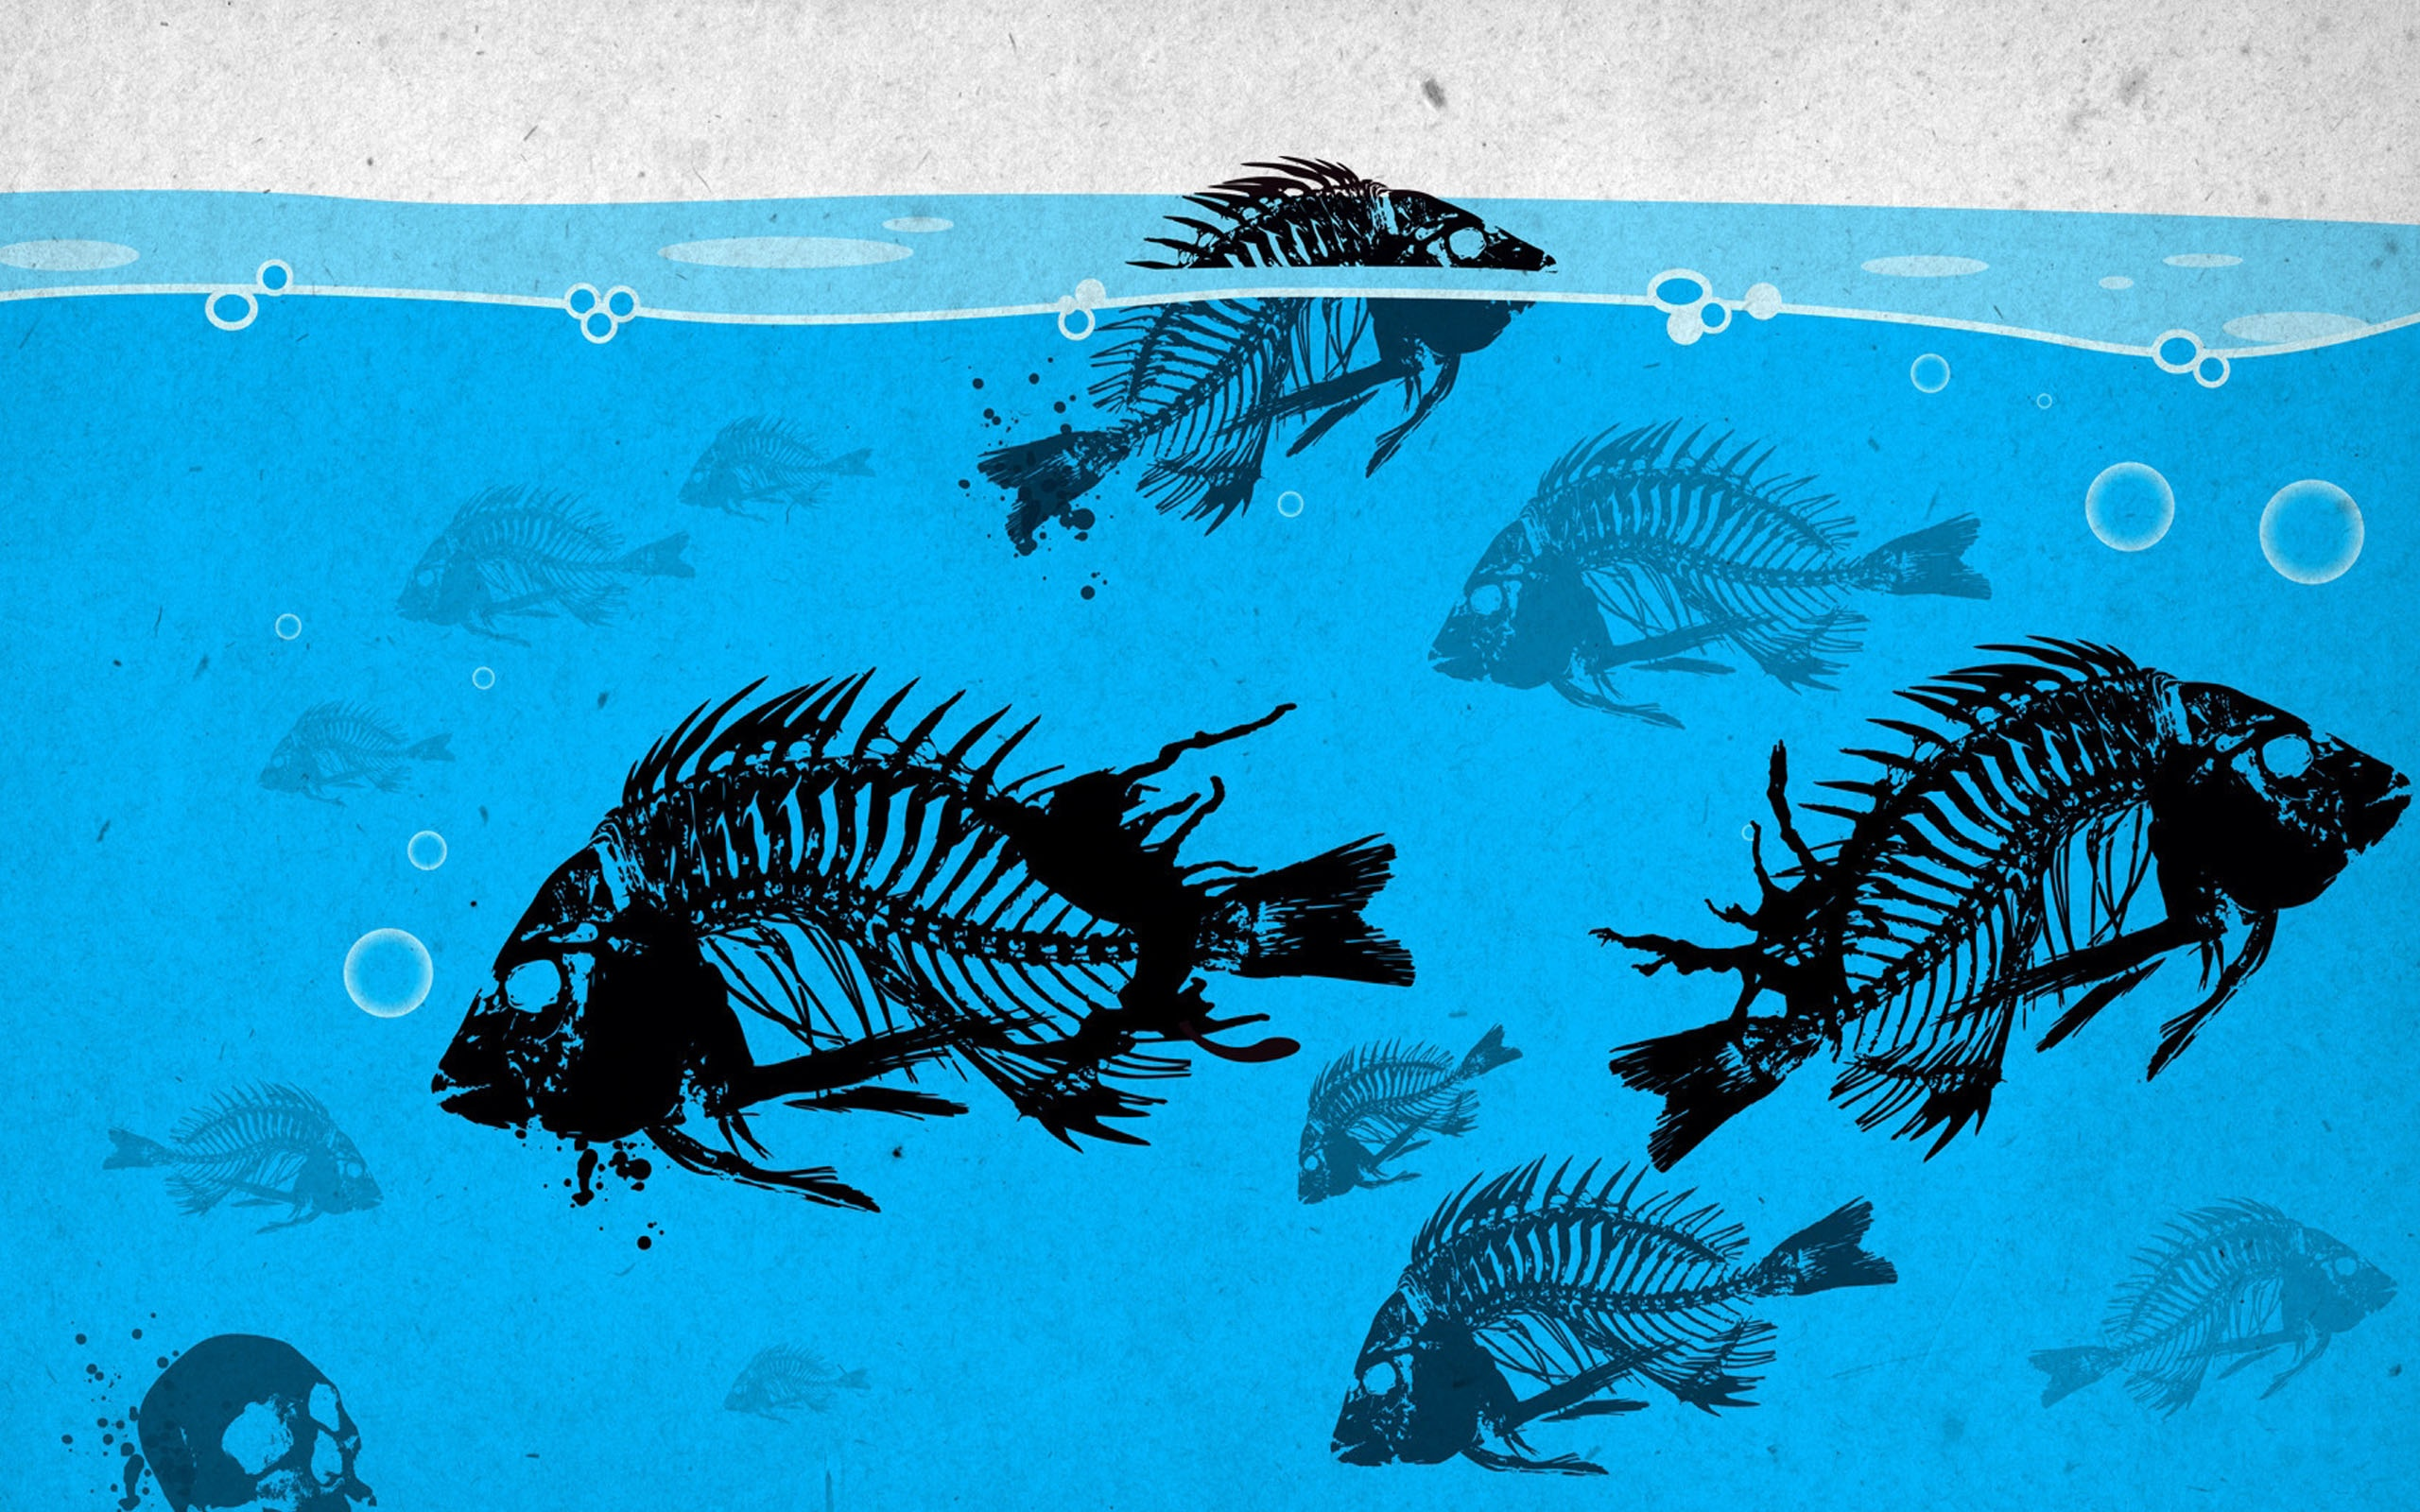 Fishing Desktop wallpapers 1920x1200 2560x1600